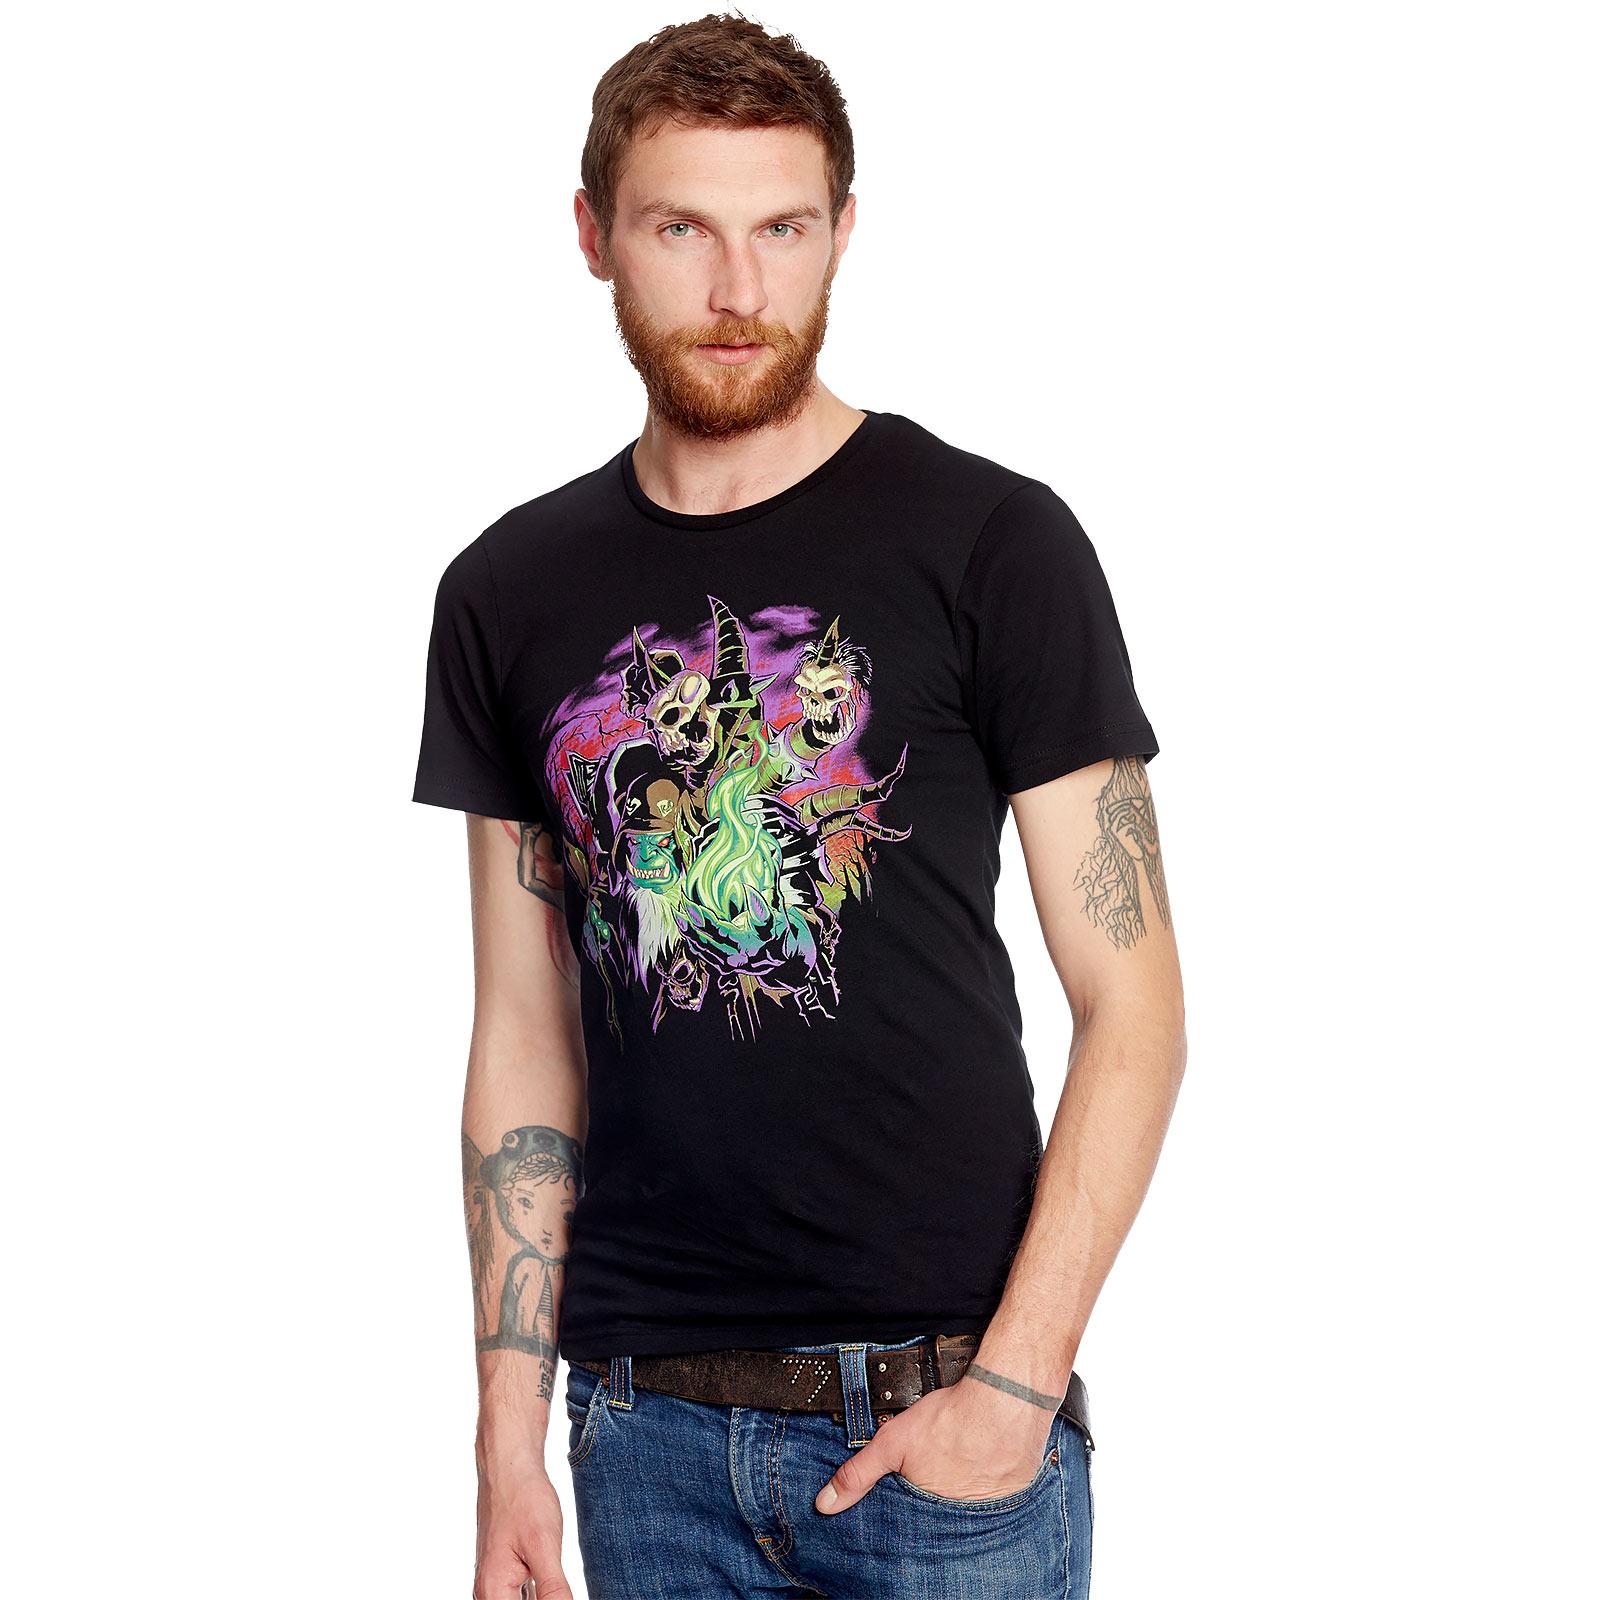 World Of Warcraft - Guldan T-Shirt schwarz